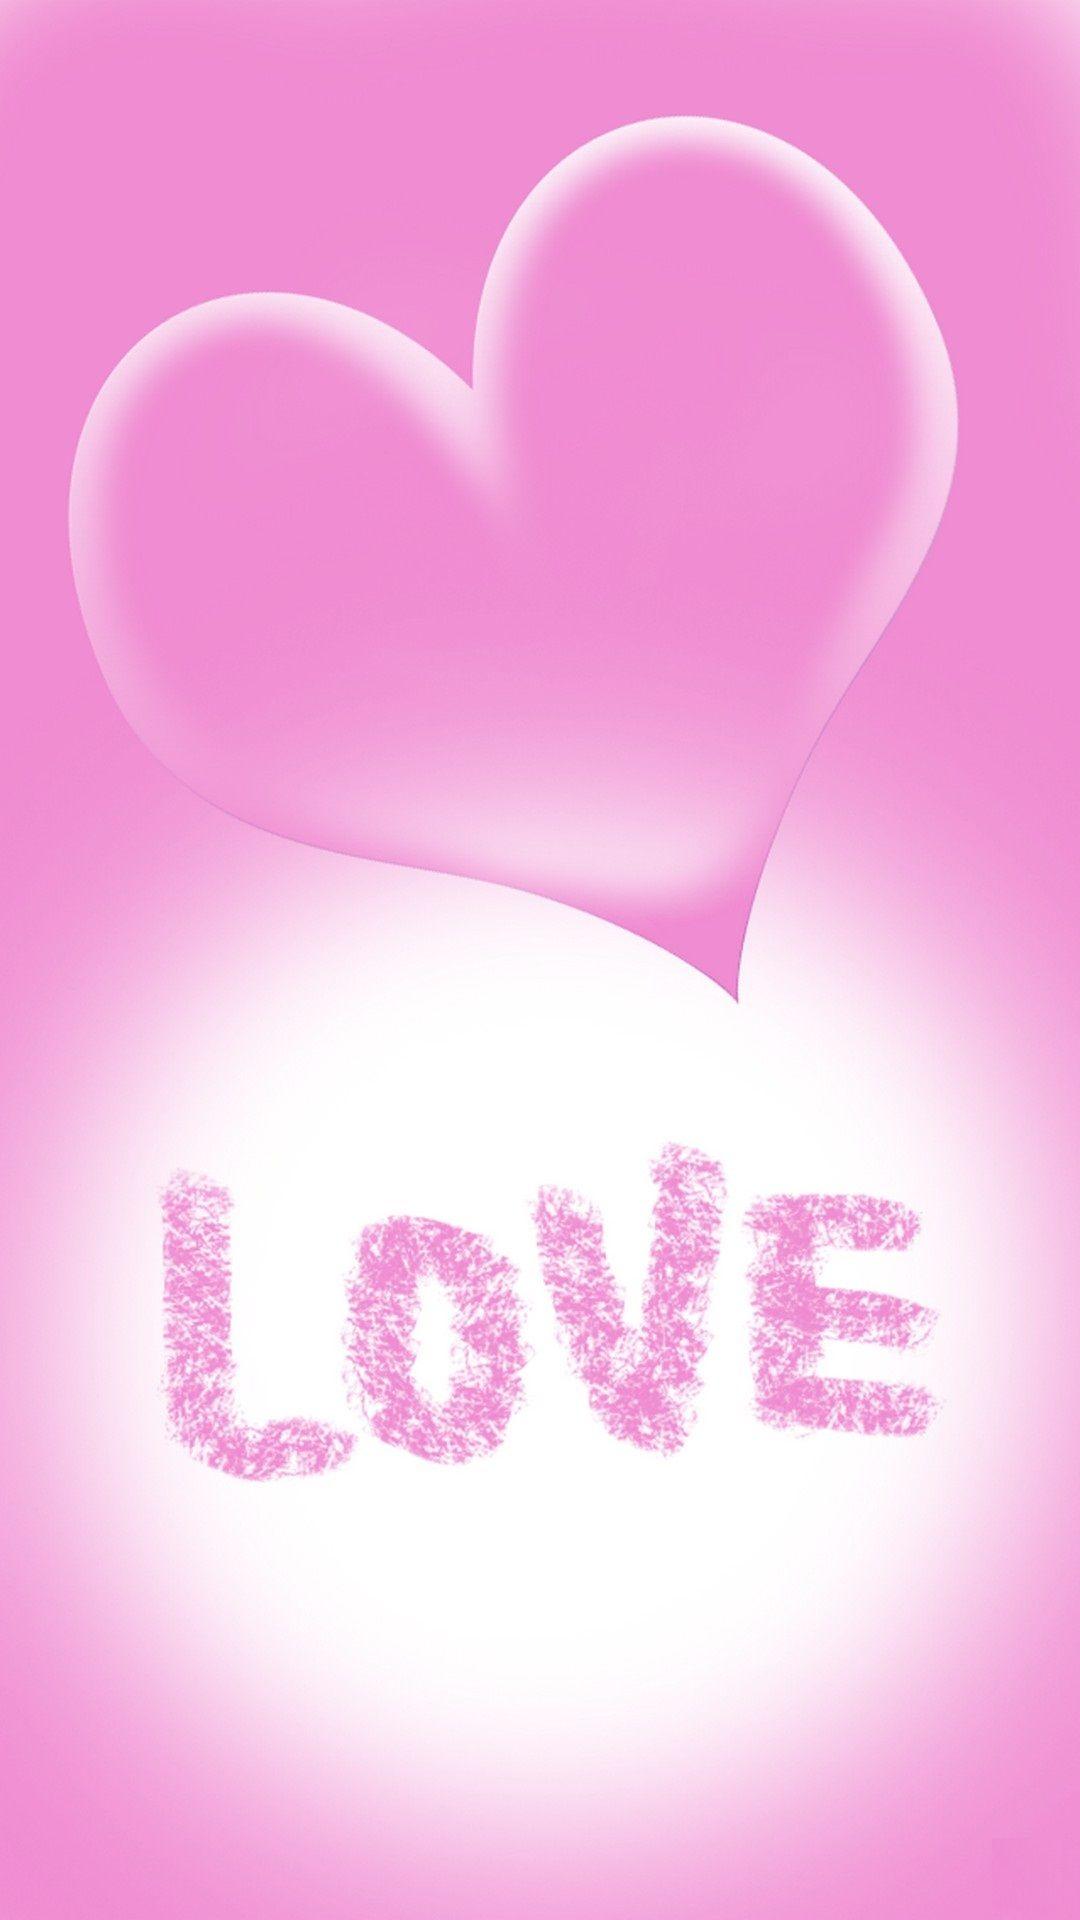 Love Pink Wallpaper In 2020 Love Pink Wallpaper Valentines Wallpaper Valentines Wallpaper Iphone